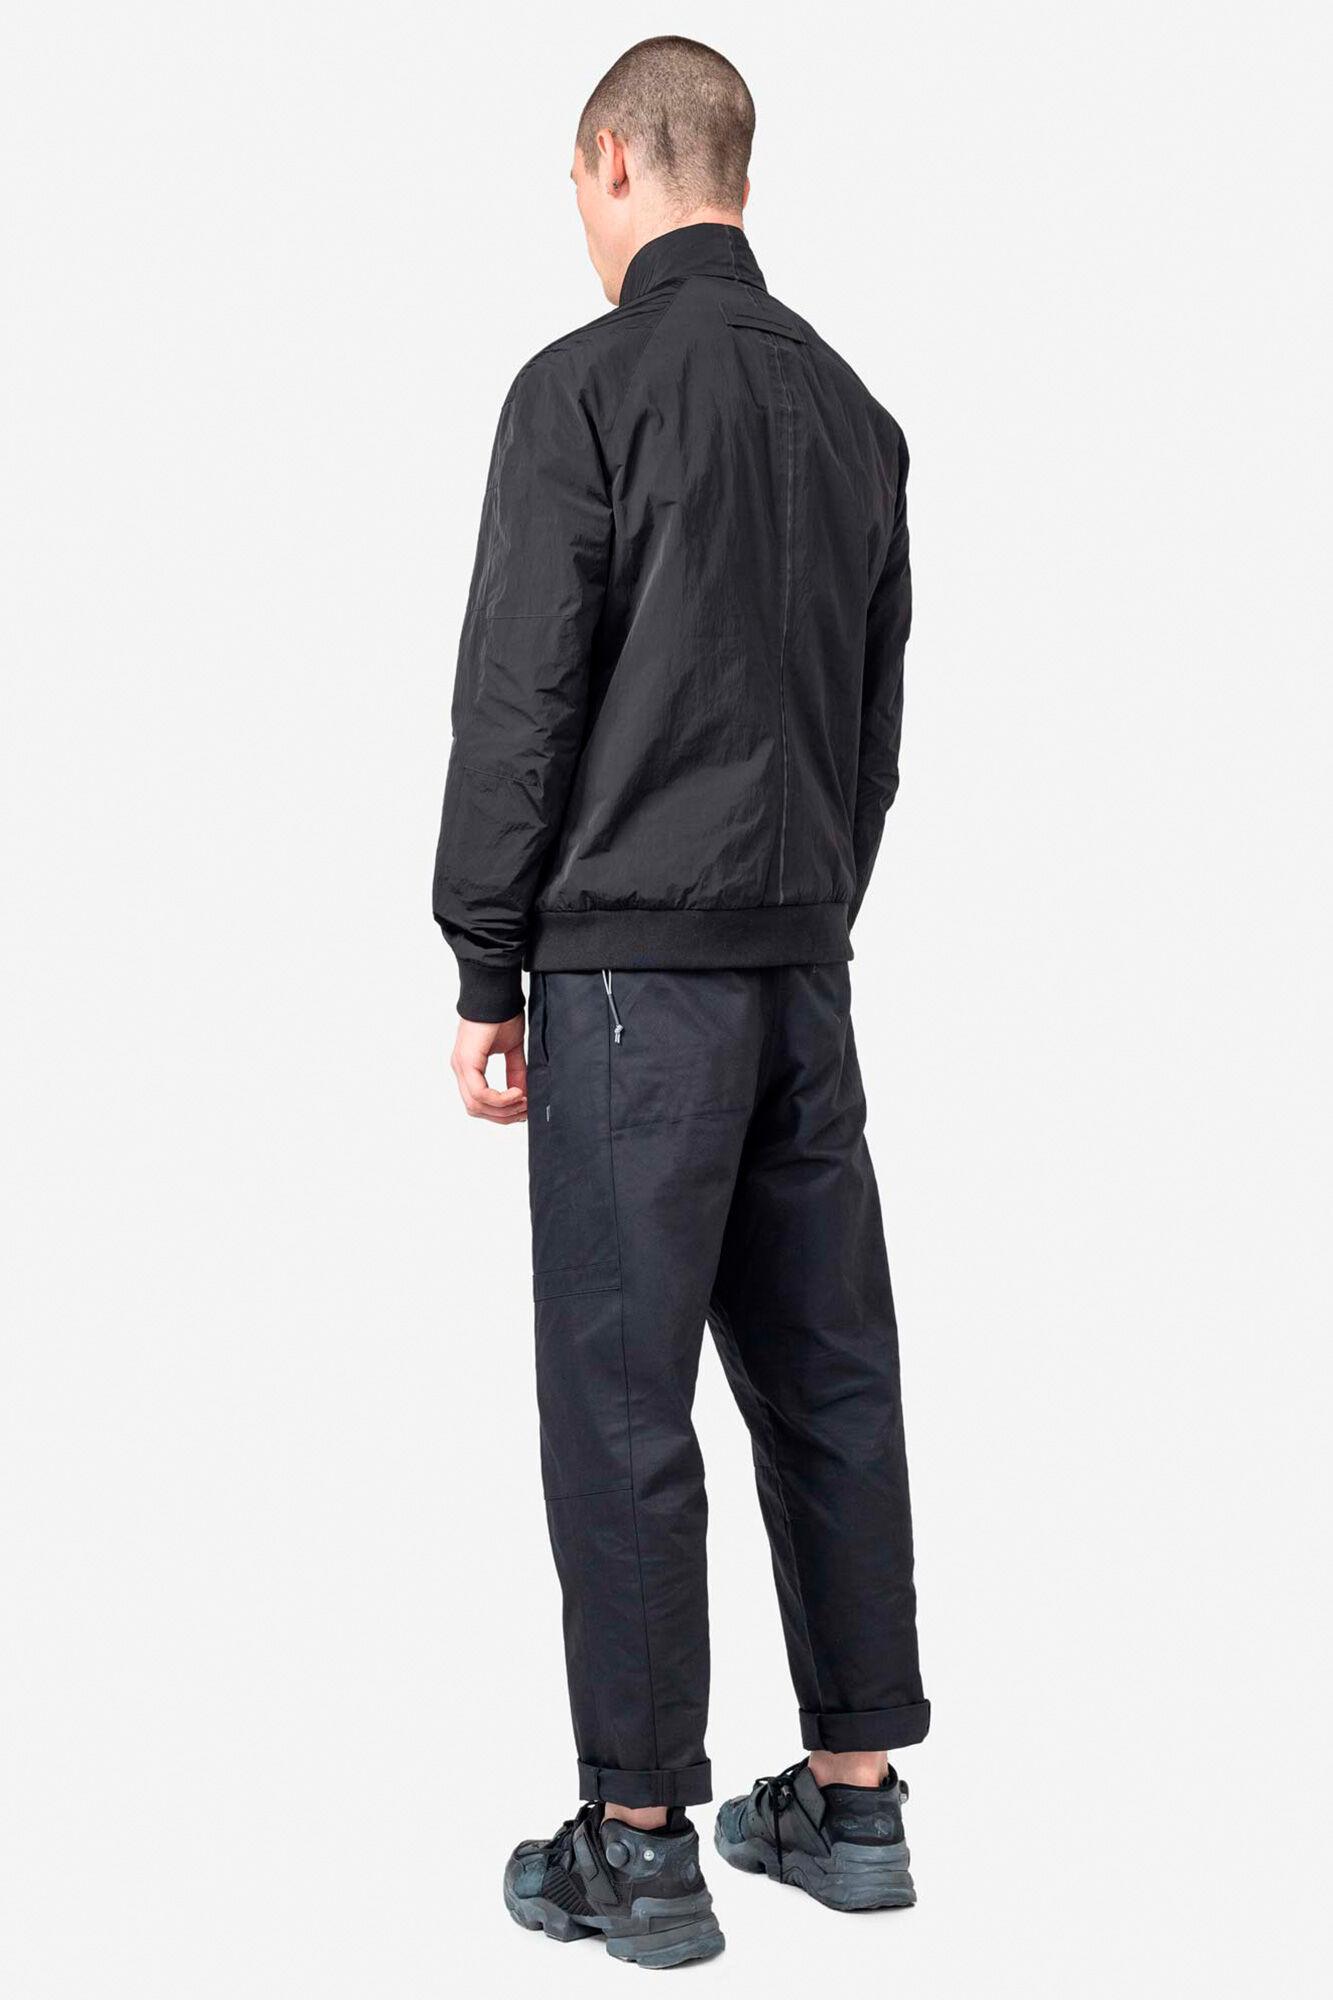 Memory fabric harrington QM200, BLACK